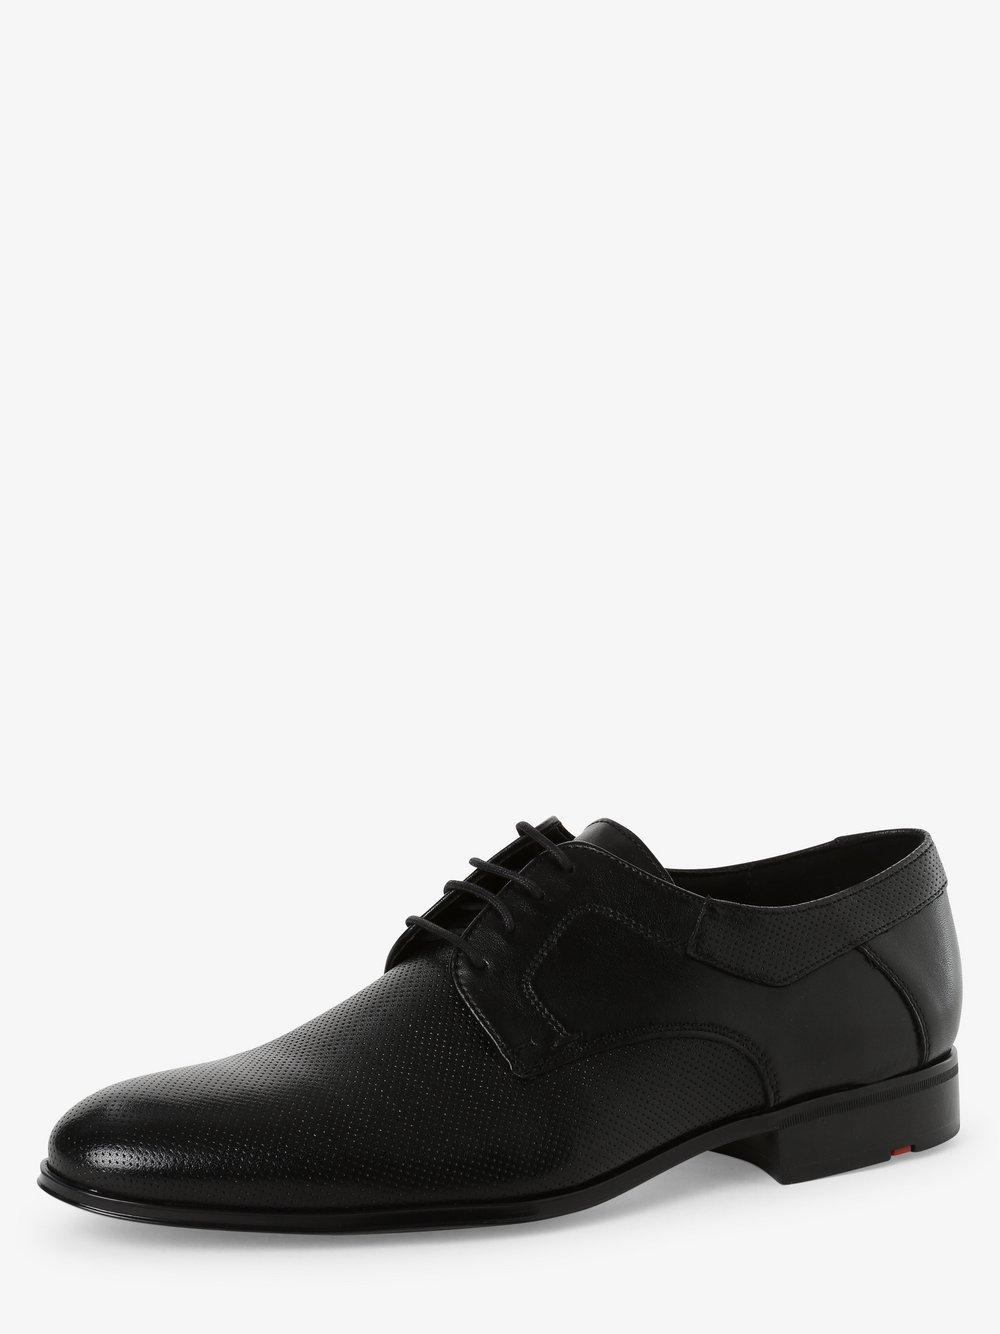 Lloyd – Męskie buty sznurowane ze skóry, czarny Van Graaf 474432-0001